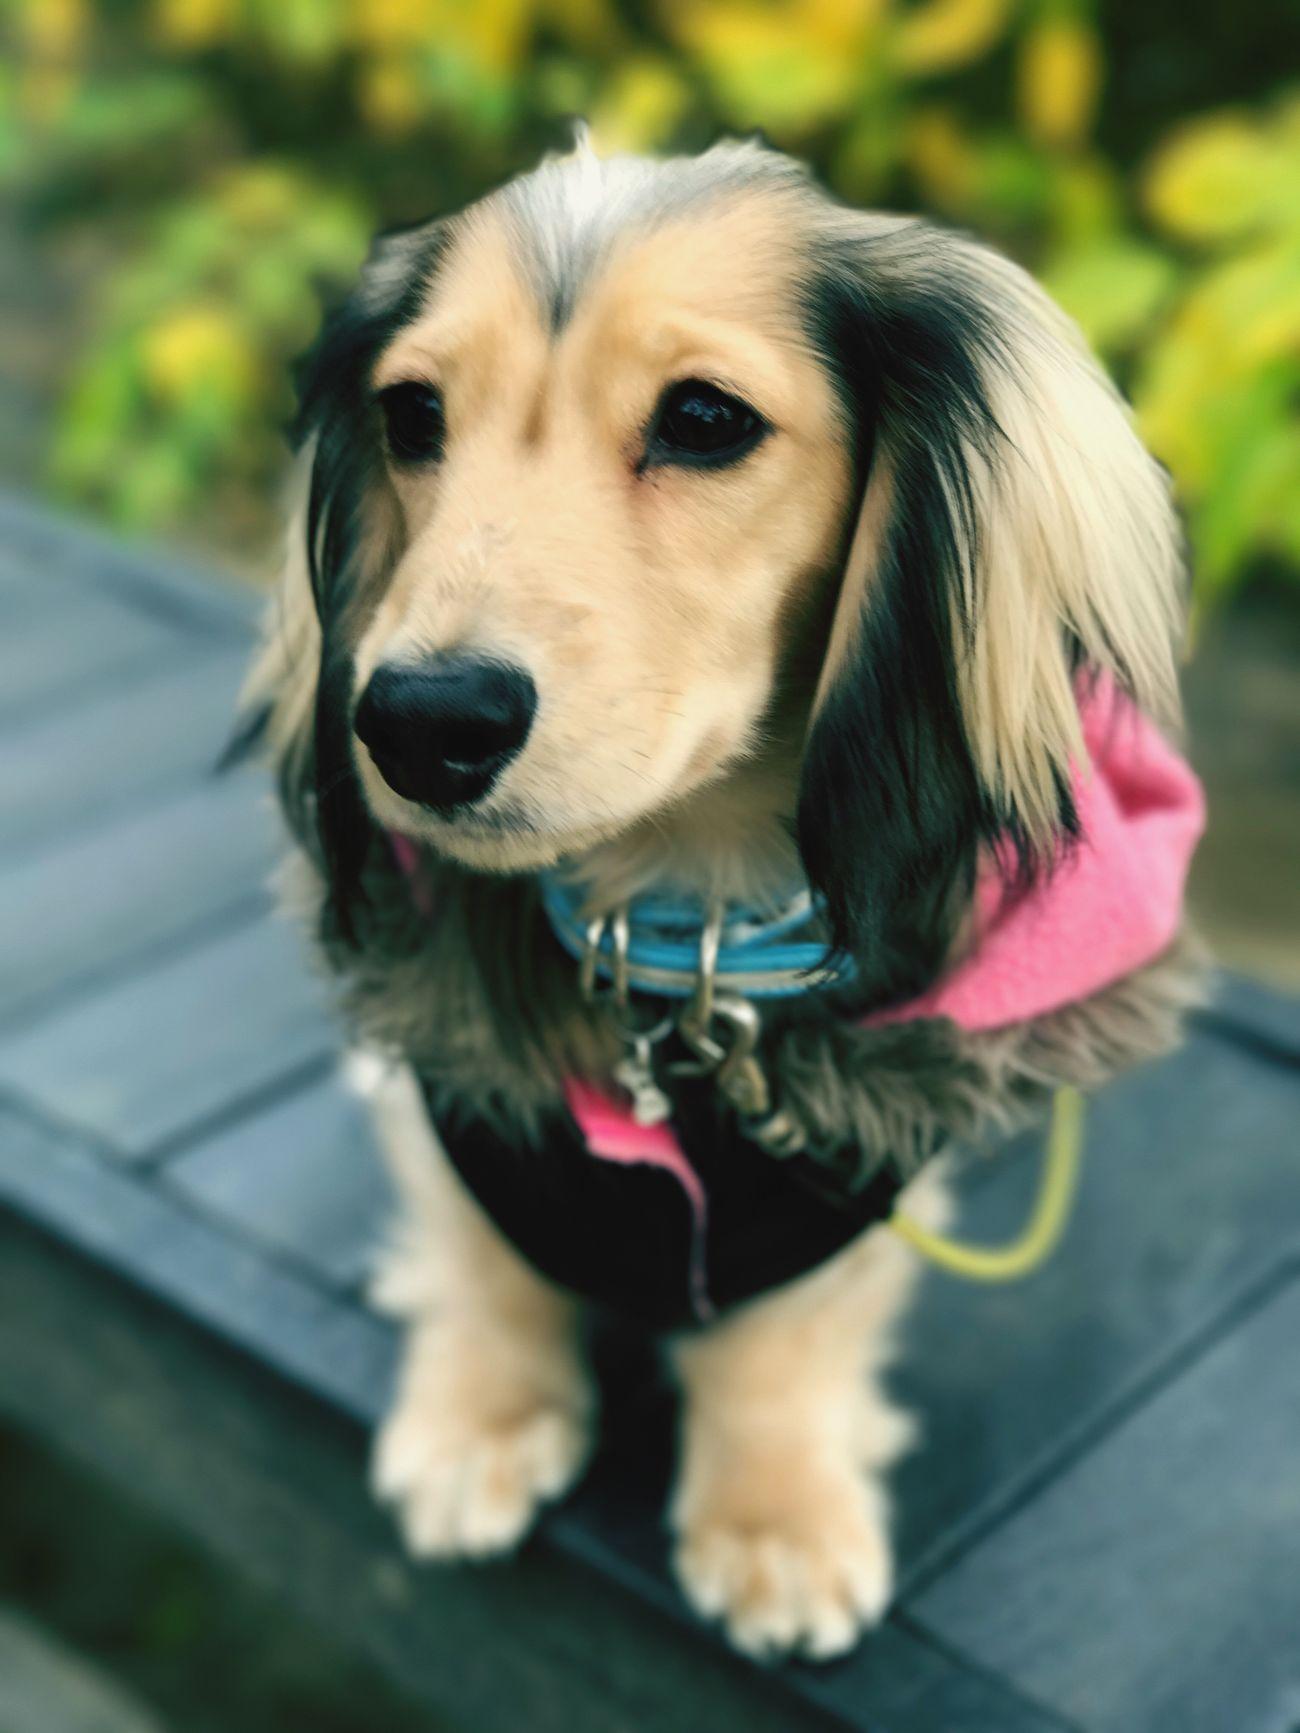 敷島公園 Dog Close-up IPhone7Plus Autumn